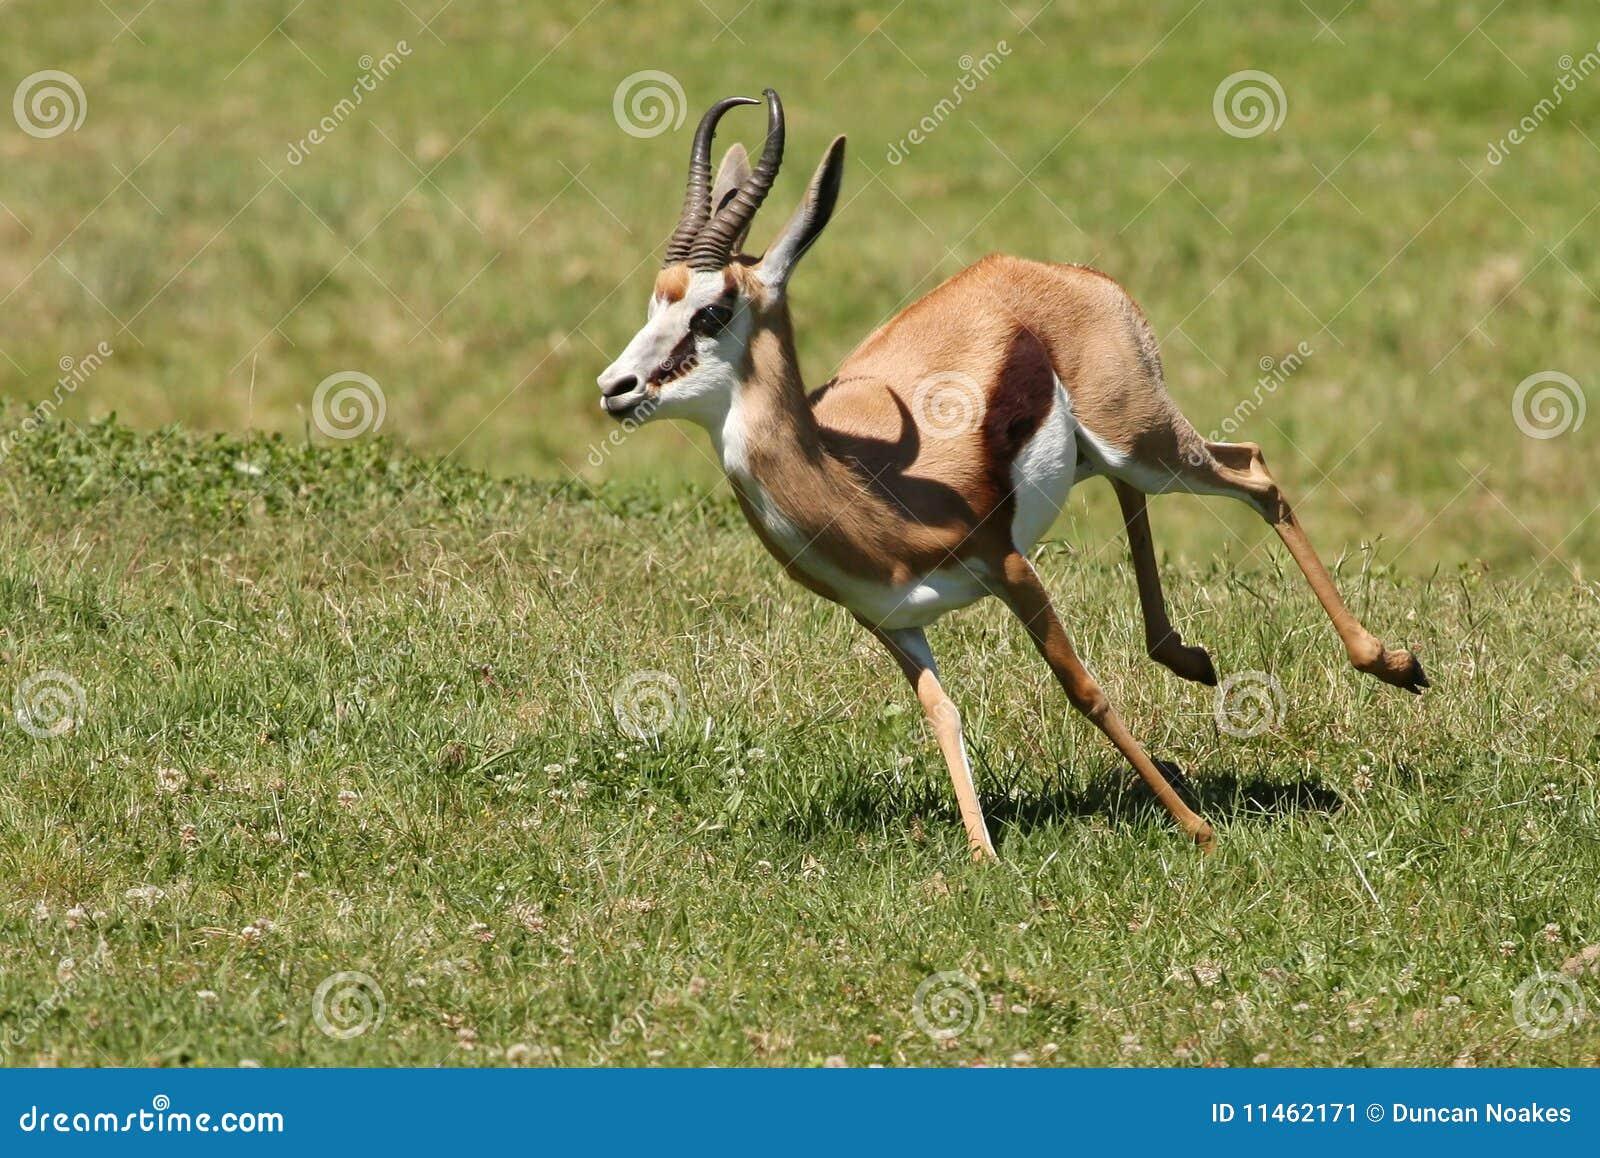 Springbuck Antelope Running Stock Image - Image: 11462171